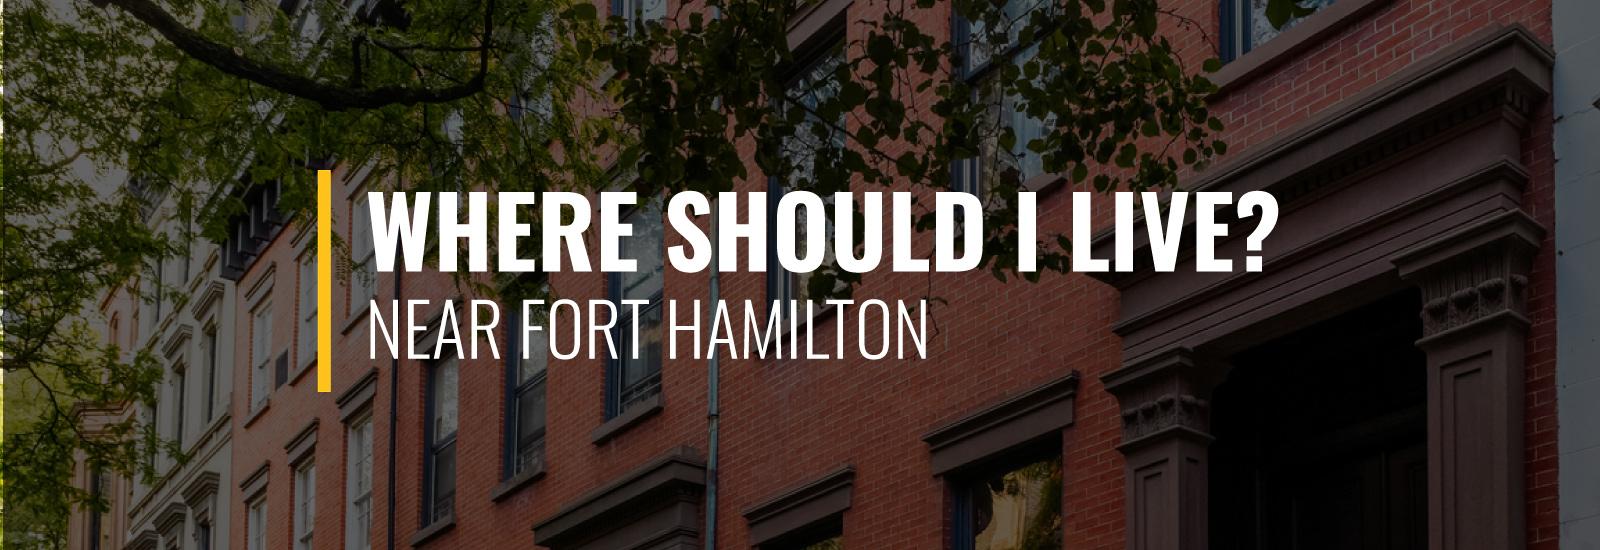 Where Should I Live Near Fort Hamilton?